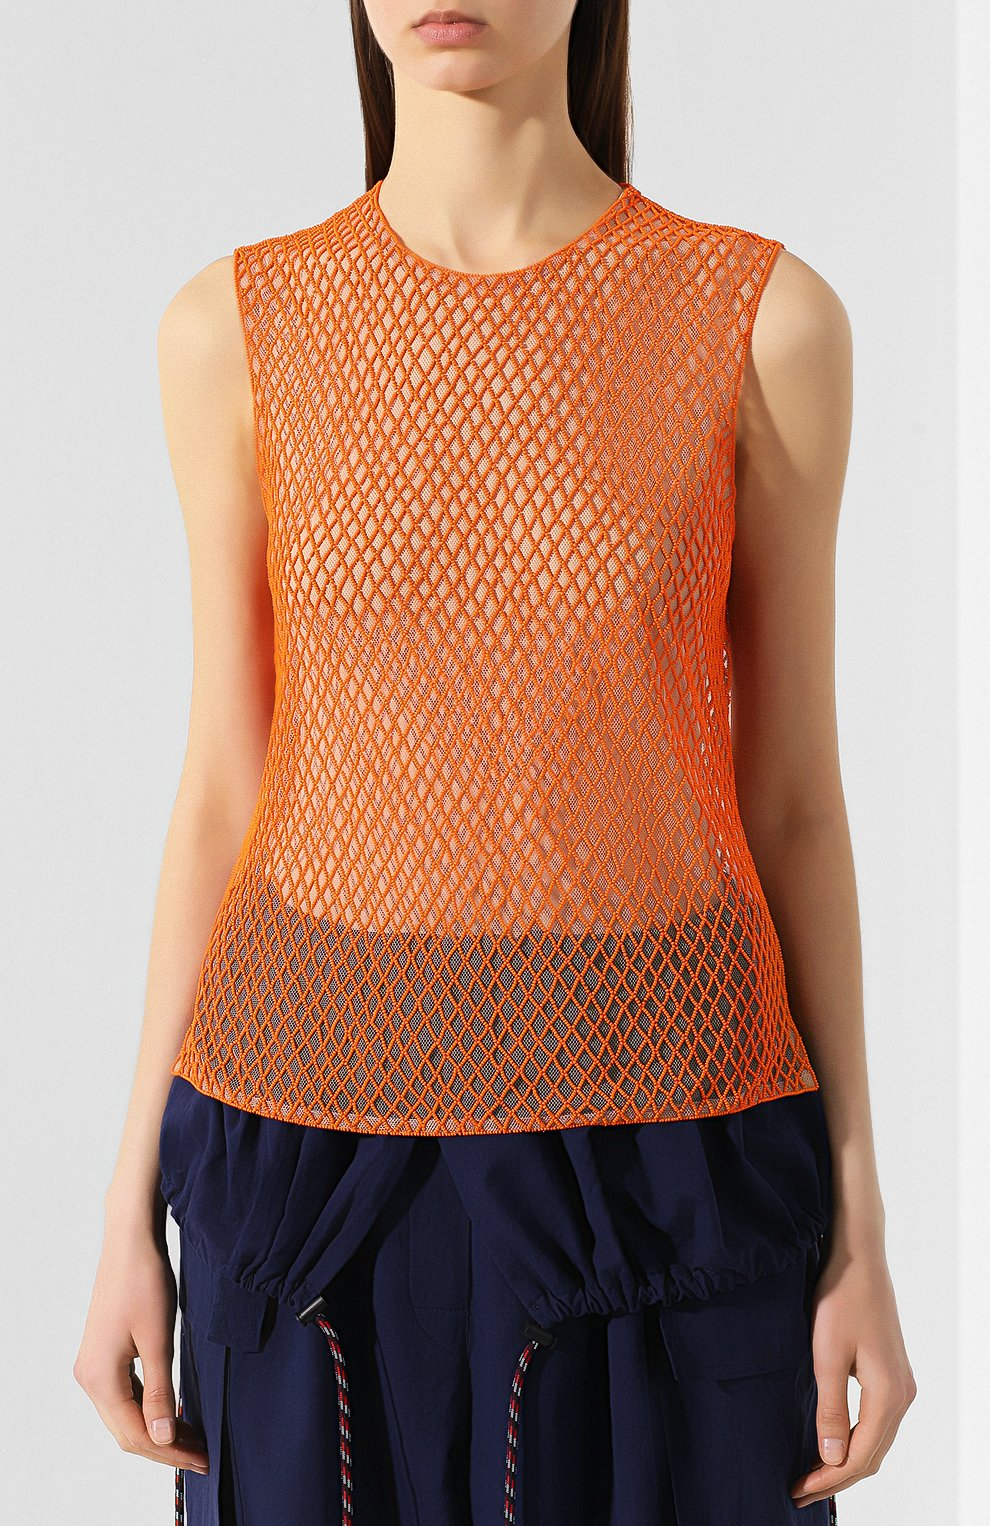 Топ Dries Van Noten оранжевый   Фото №3